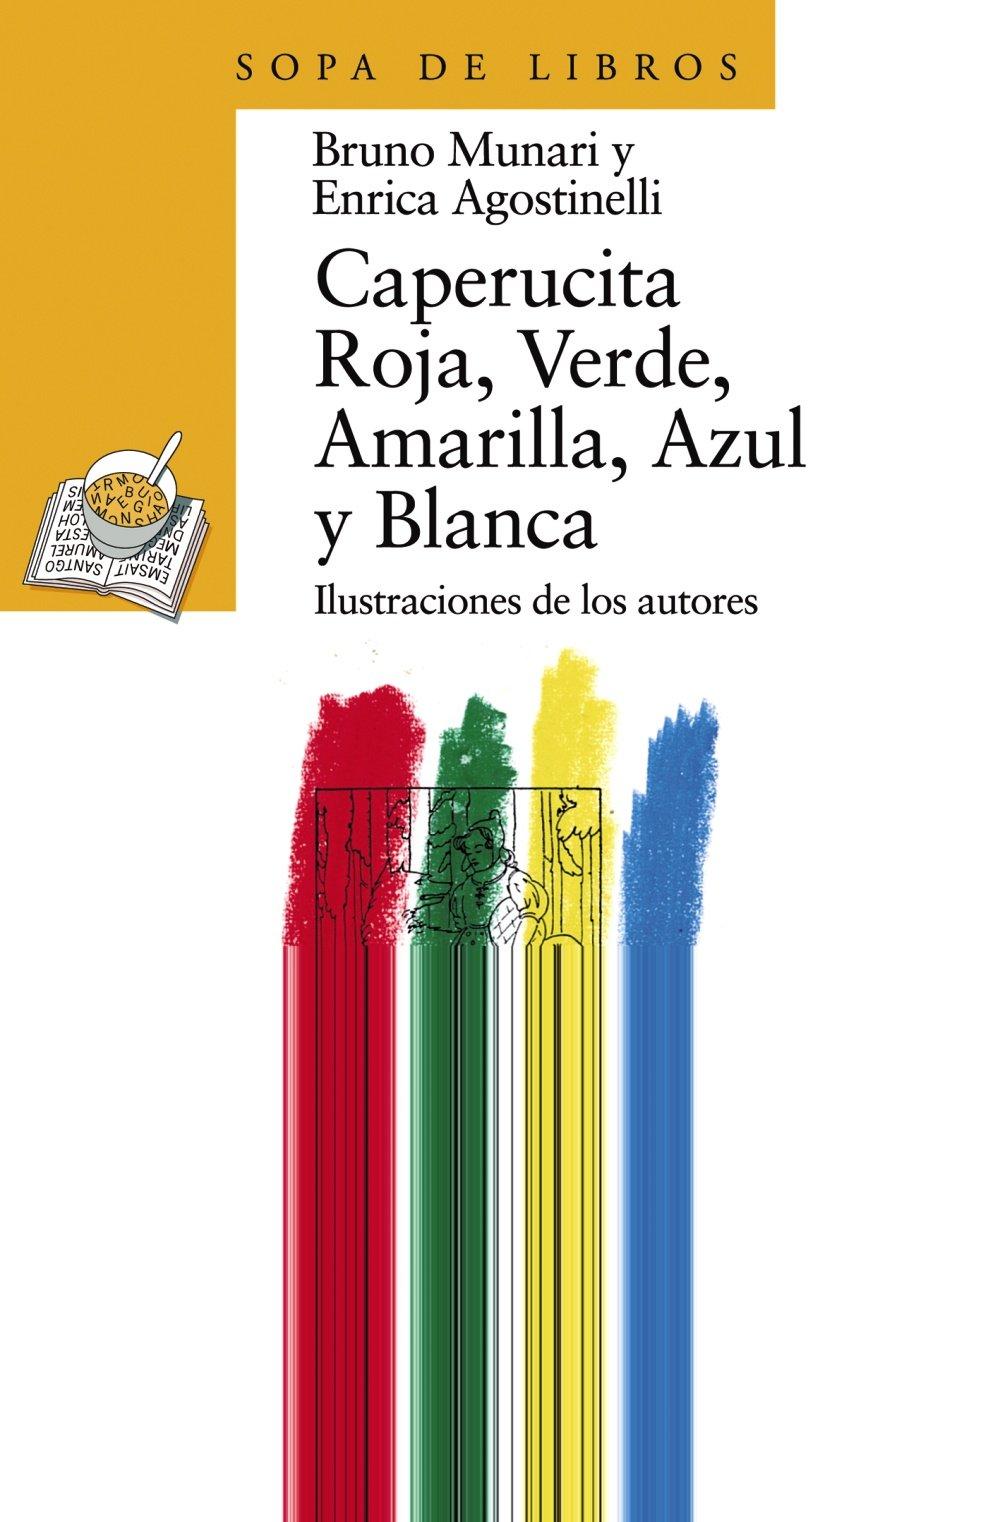 Caperucita Roja, Verde, Amarilla, Azul Y Blanca / Little Red Riding Hood, Green, Yellow, Blue and White (Sopa De Libros / Soup of Books) (Spanish Edition) by Enrica Agostinelli Bruno Munari